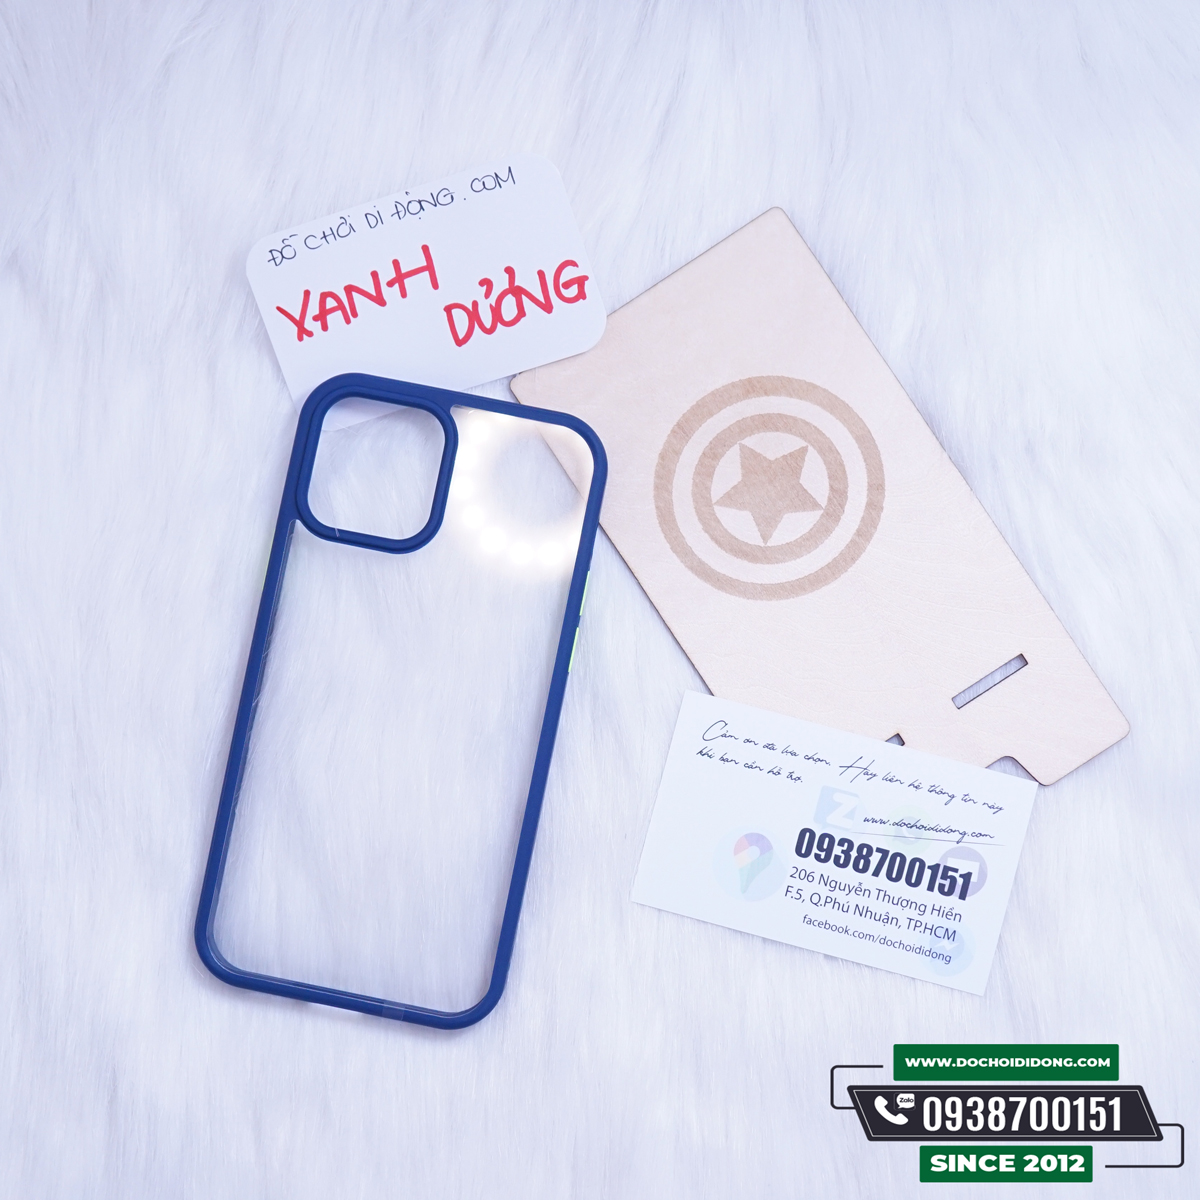 op-lung-iphone-12-pro-max-rock-vien-trong-lung-trong-vien-mau-lung-nham-chong-soc-tong-hop